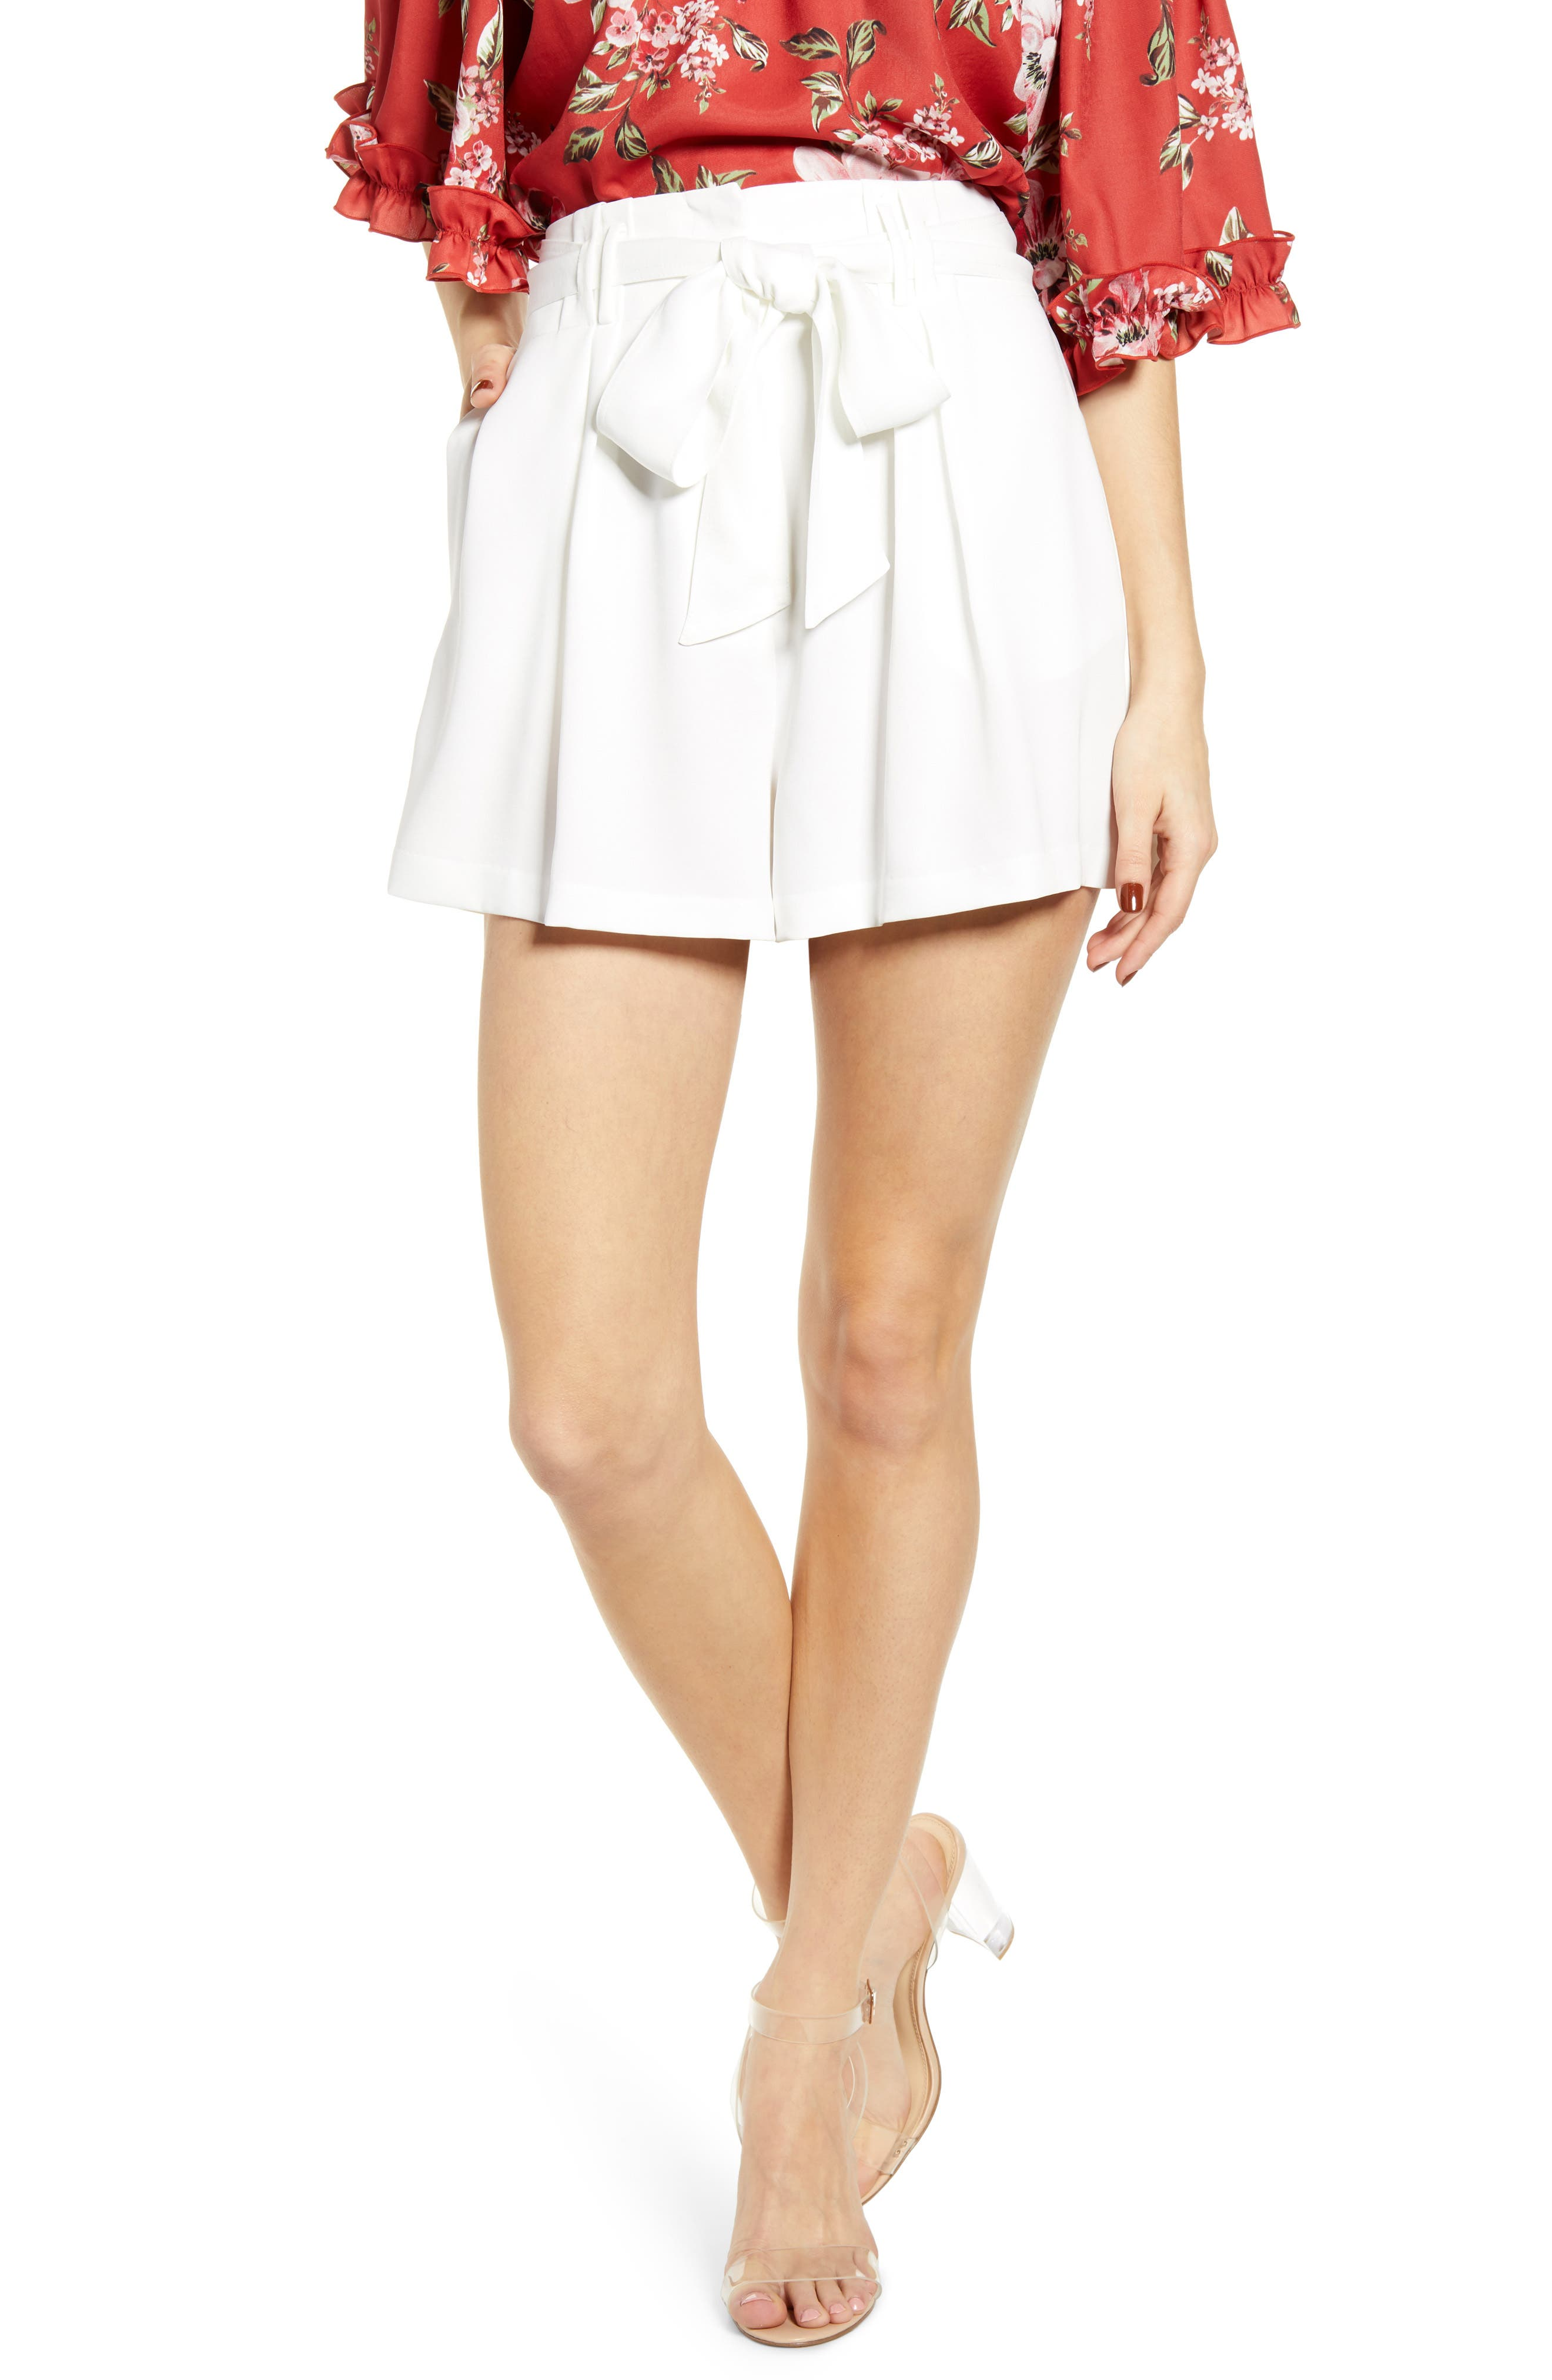 1940s Shorts | High Waisted Shorts | Sailor Shorts Womens Wayf Pleated Tie Waist Shorts $79.00 AT vintagedancer.com